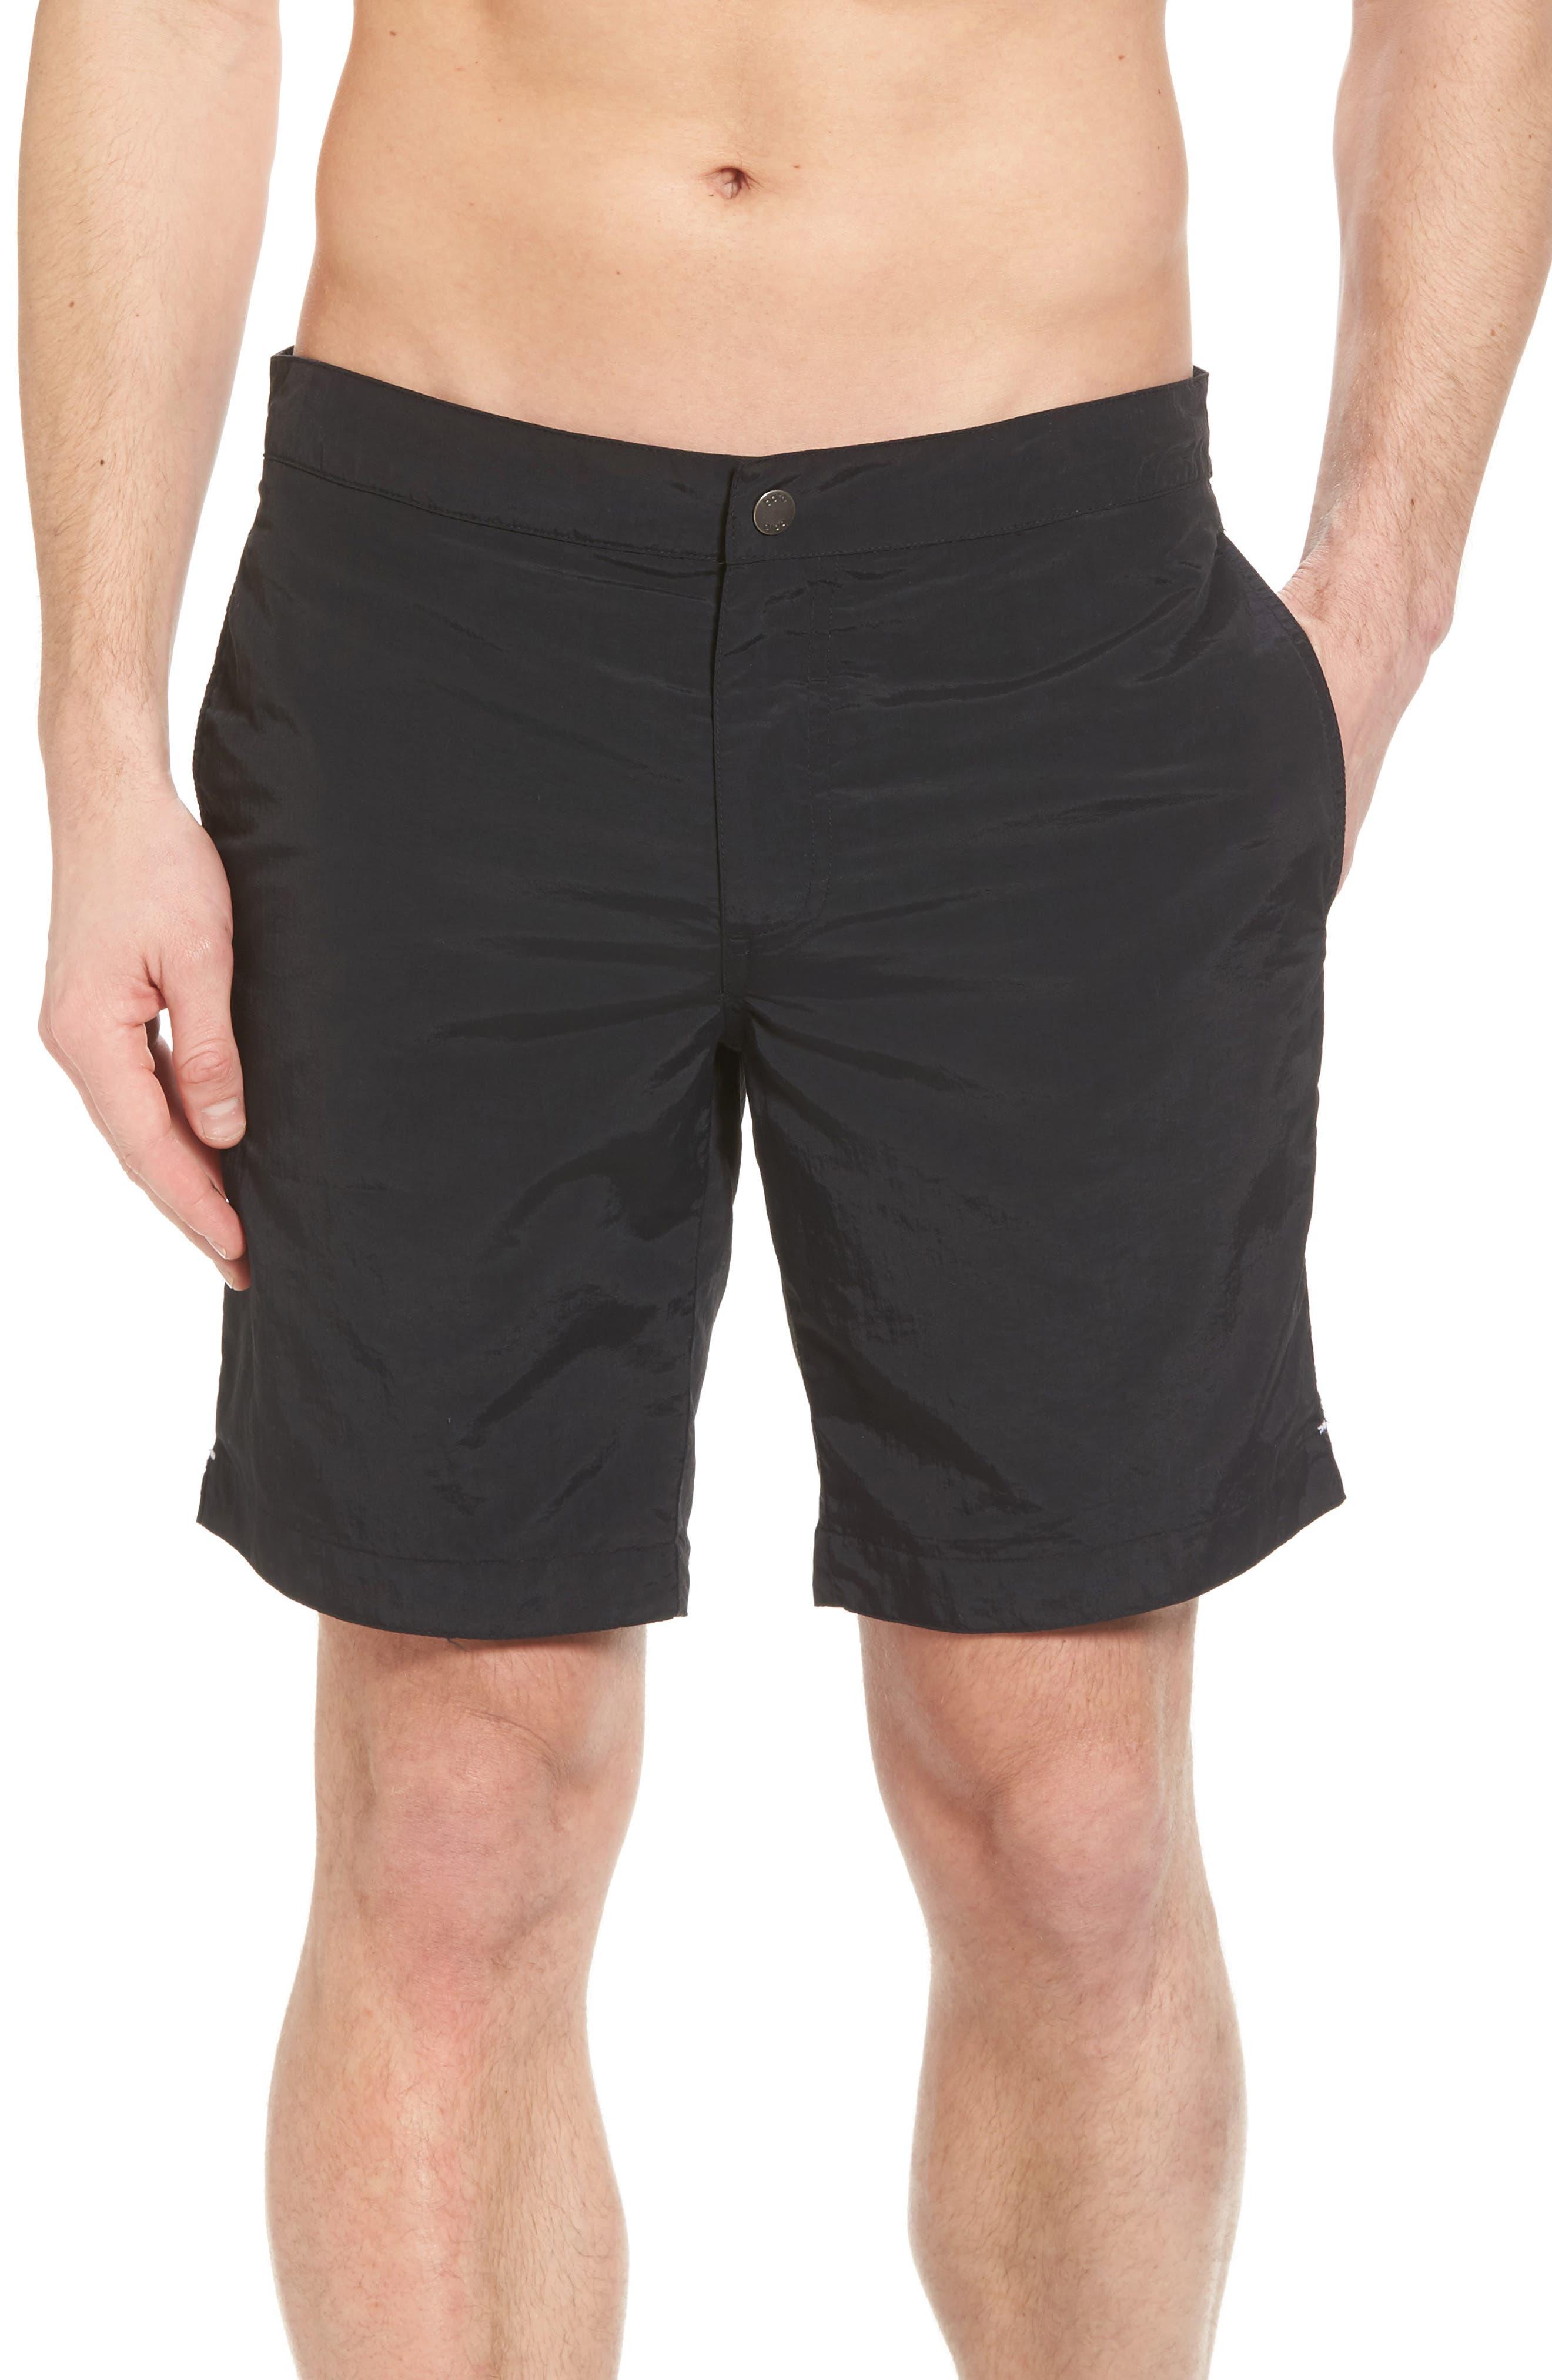 'Aruba - Island' Tailored Fit 8.5 Inch Board Shorts,                             Main thumbnail 1, color,